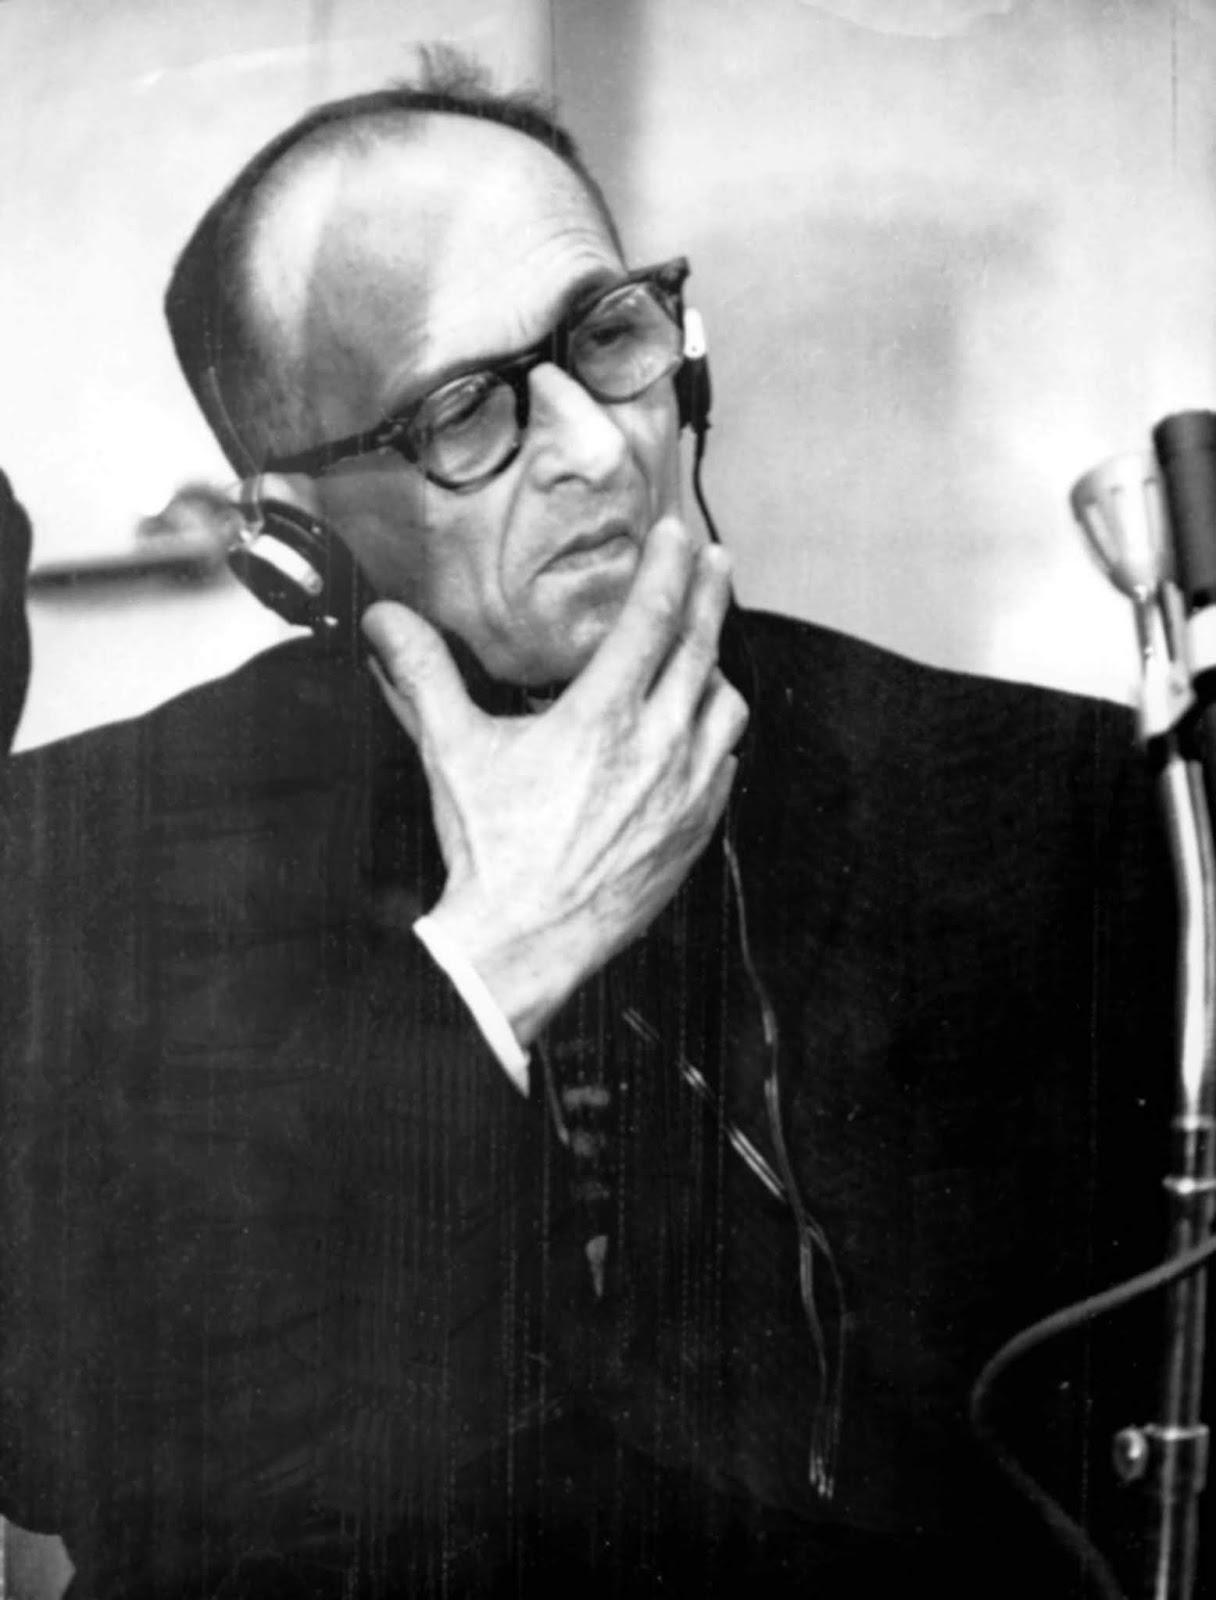 Adolf Eichmann listening to the verdict in his trial in December 1961.